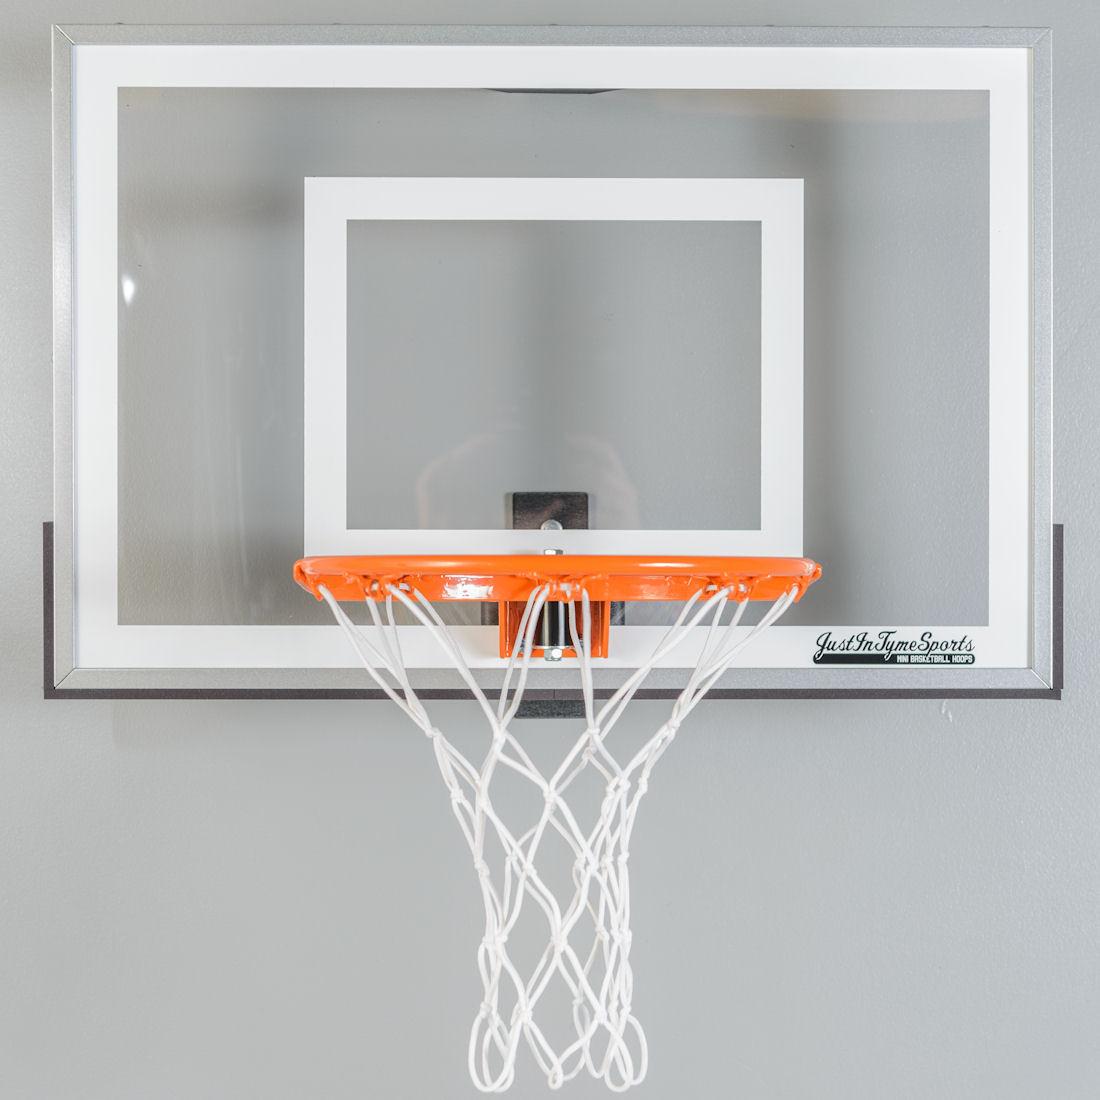 Mini Pro 2 0 Basketball Hoop Set Ltp Justintymesports